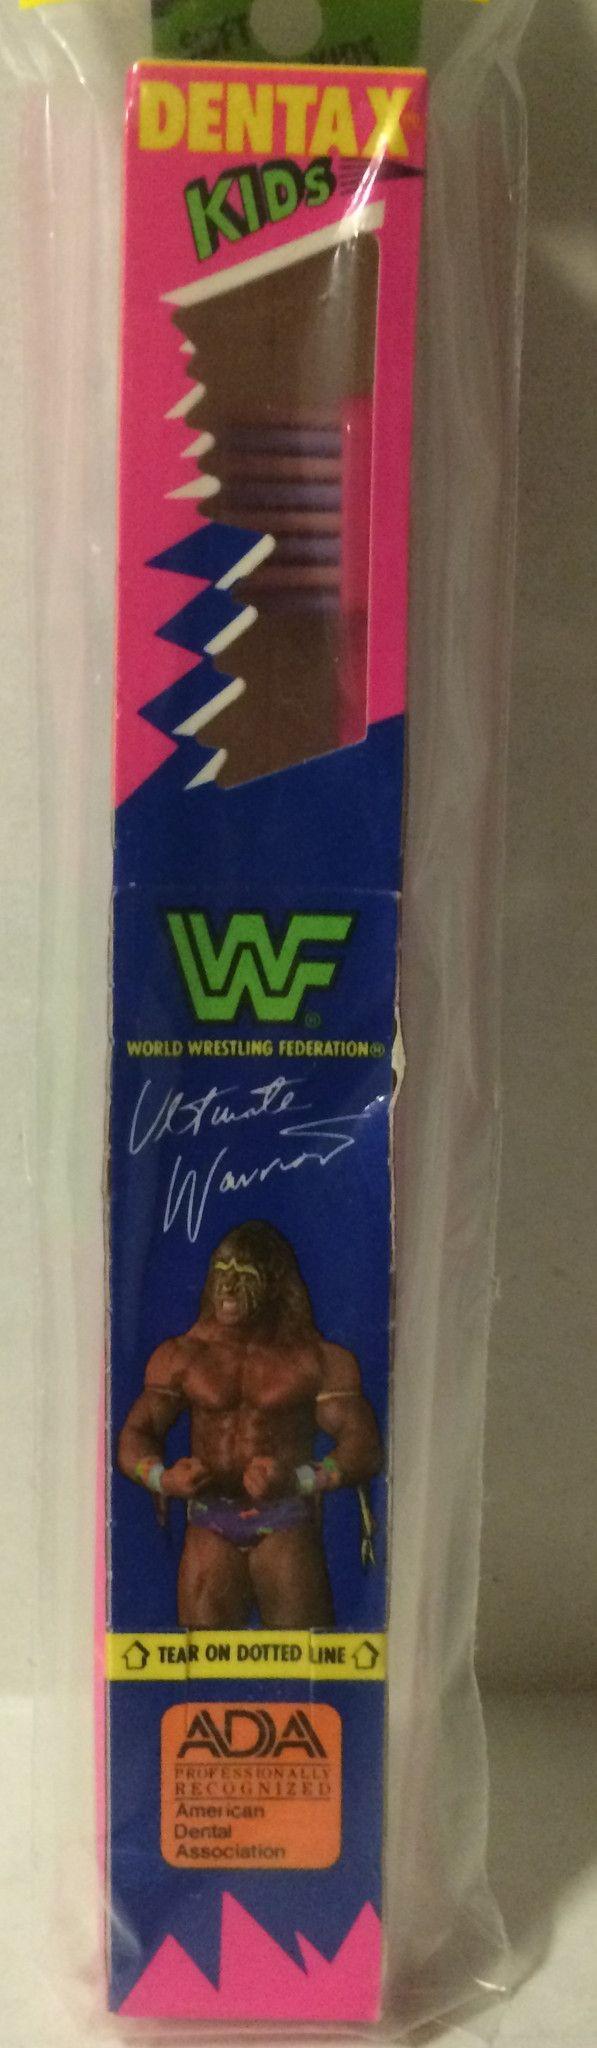 (GBS04488) - WWF WWE WCW nWo Wrestling Dentax Kids Toothbrush - Ultimate Warrior